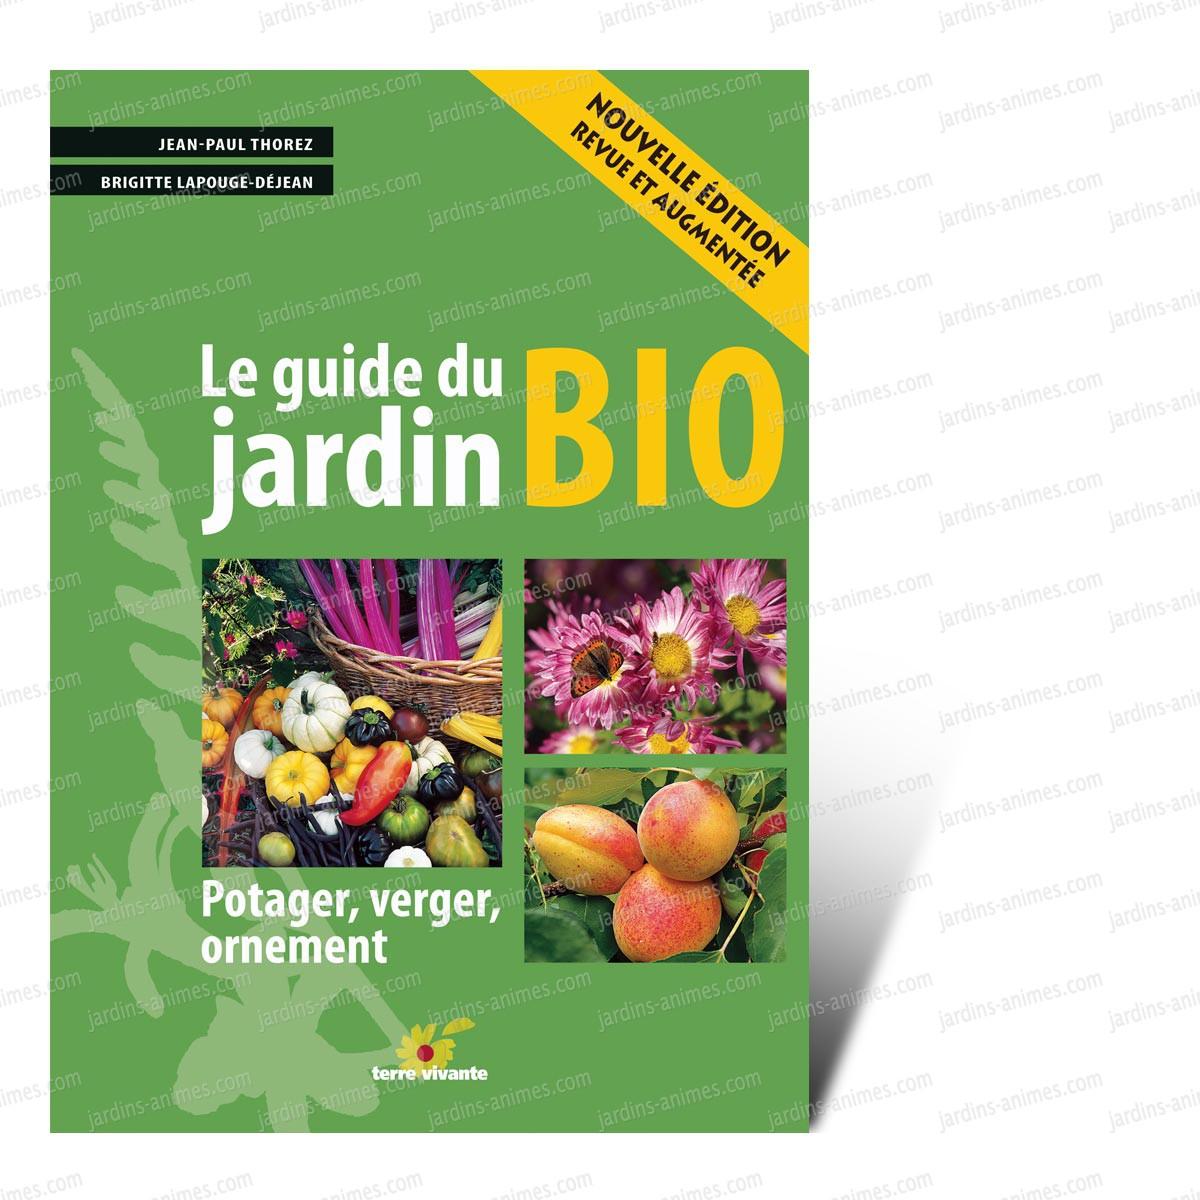 Le guide du jardin bio potager verger ornement for Jardin bio